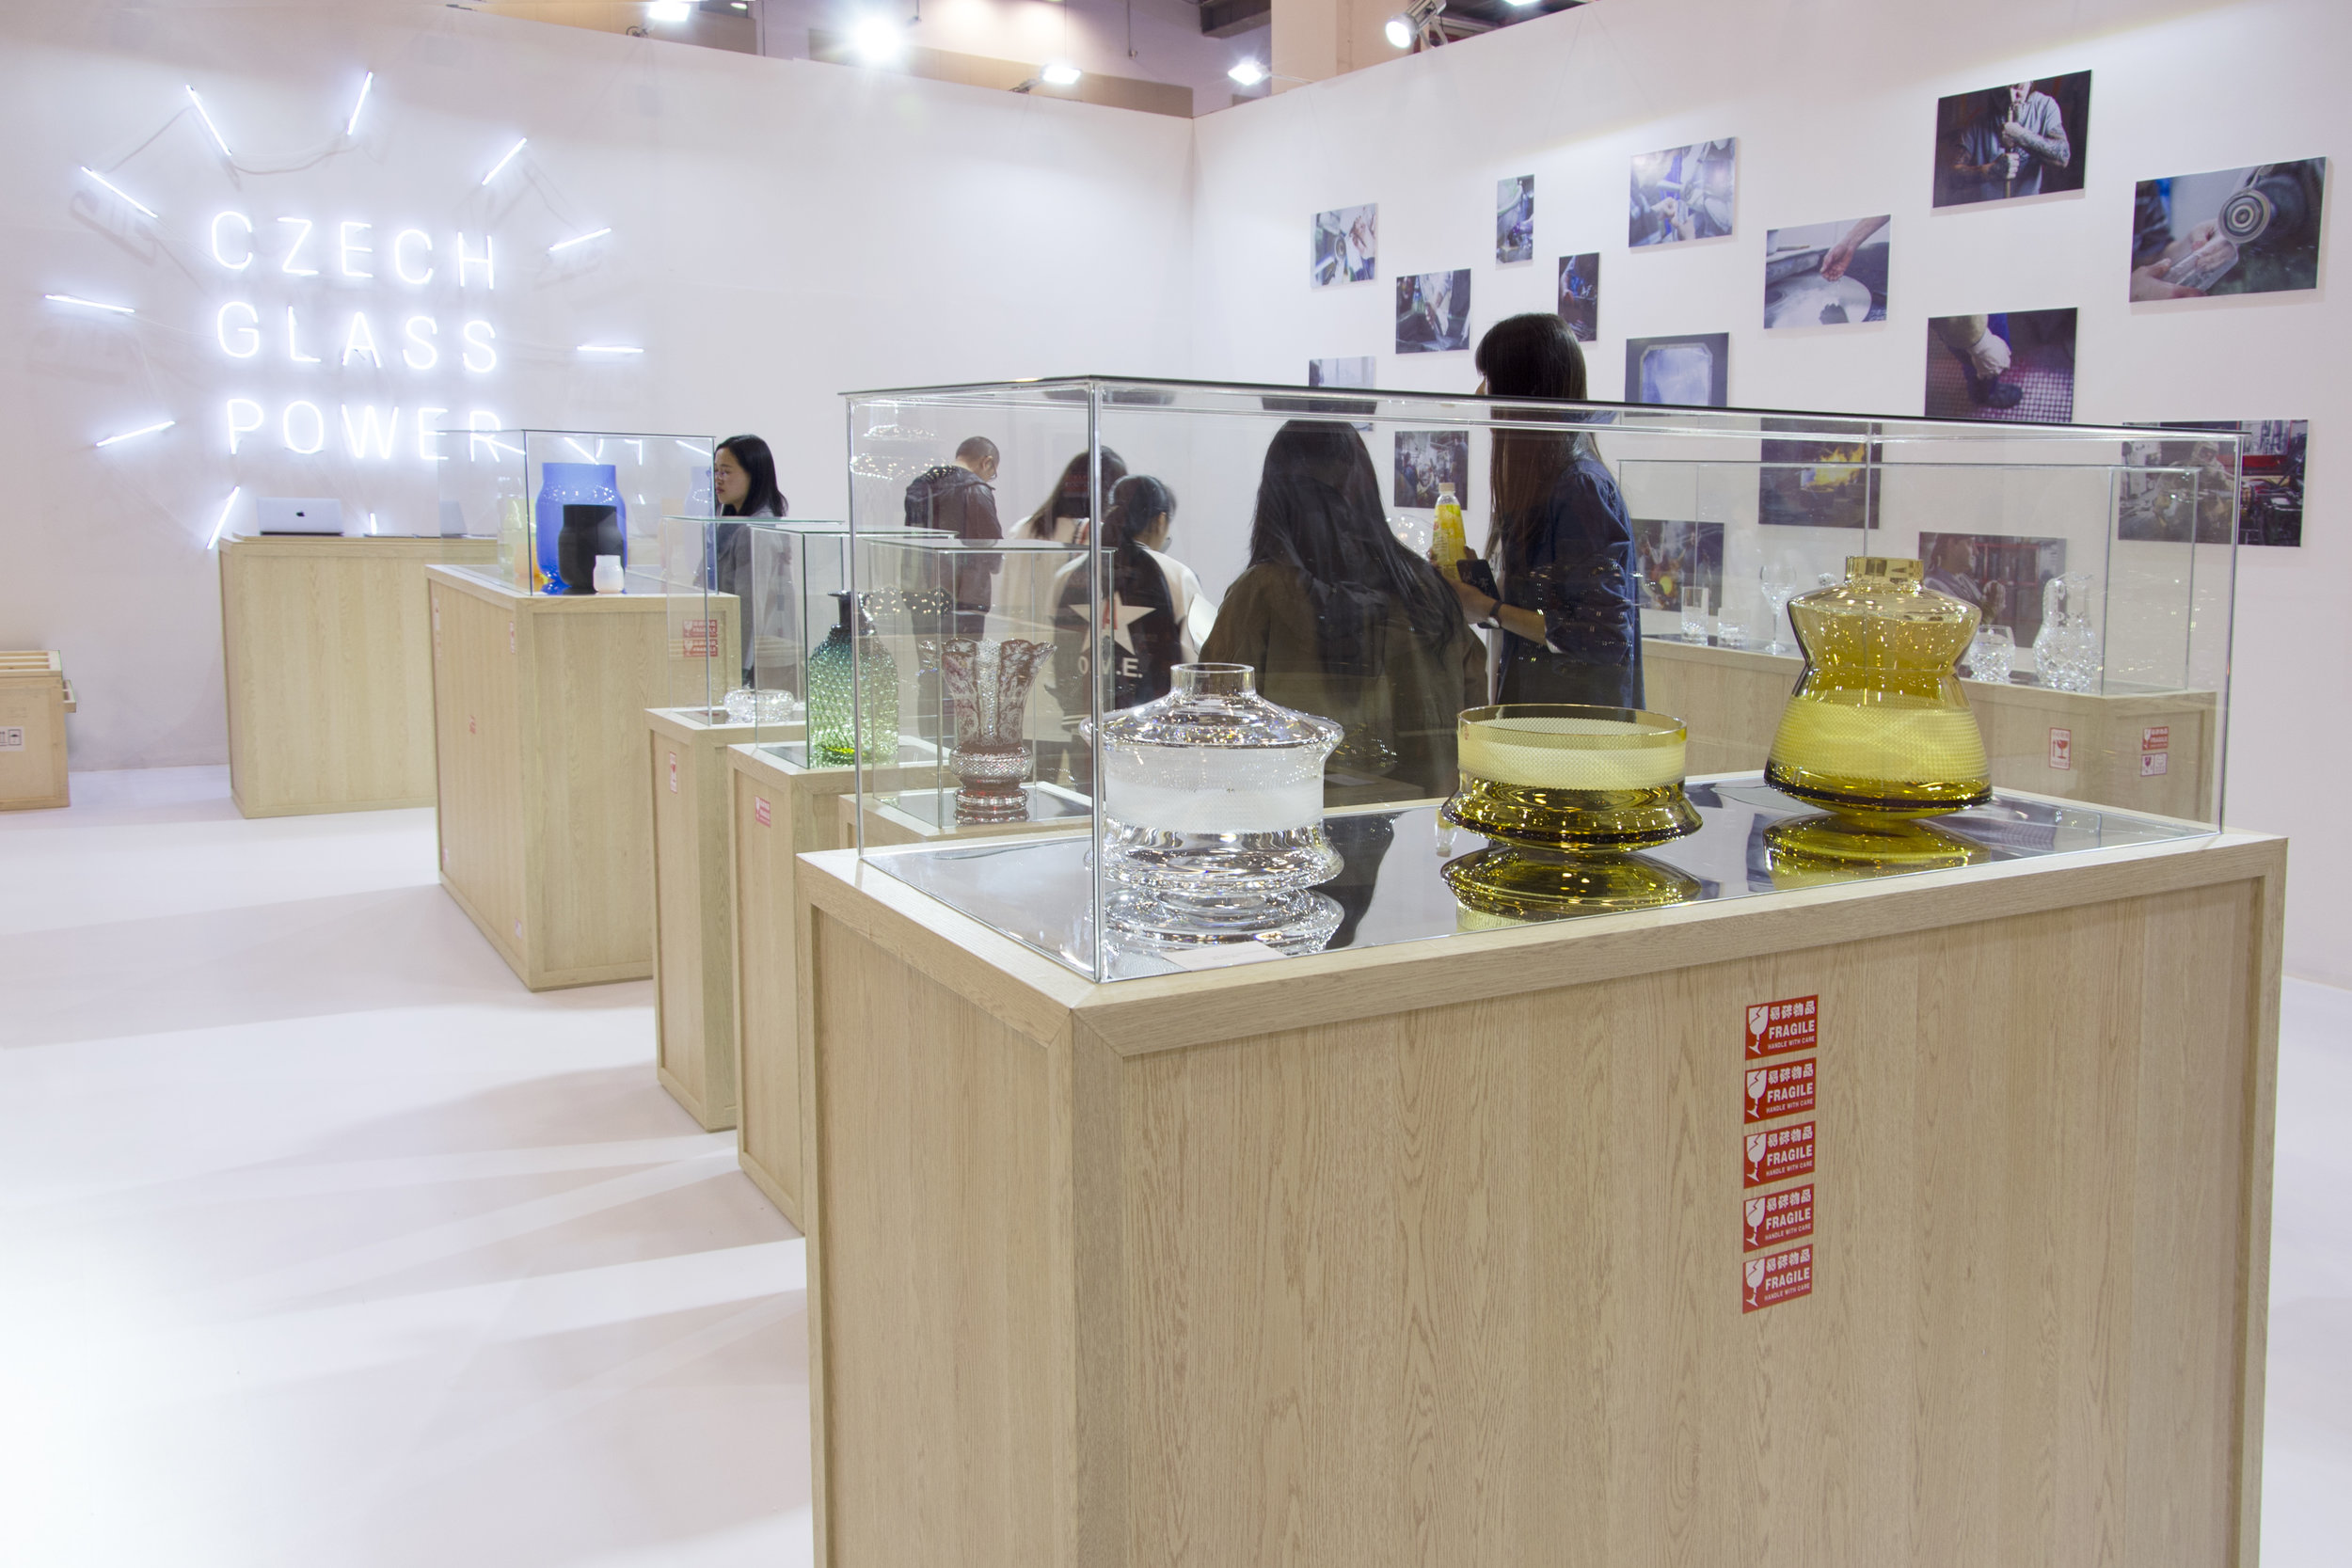 CZECH GLASS POWER - 2018Client: Czech Glass PowerInstallation and curatorial choice of the exhibitionin Suzhou / China.